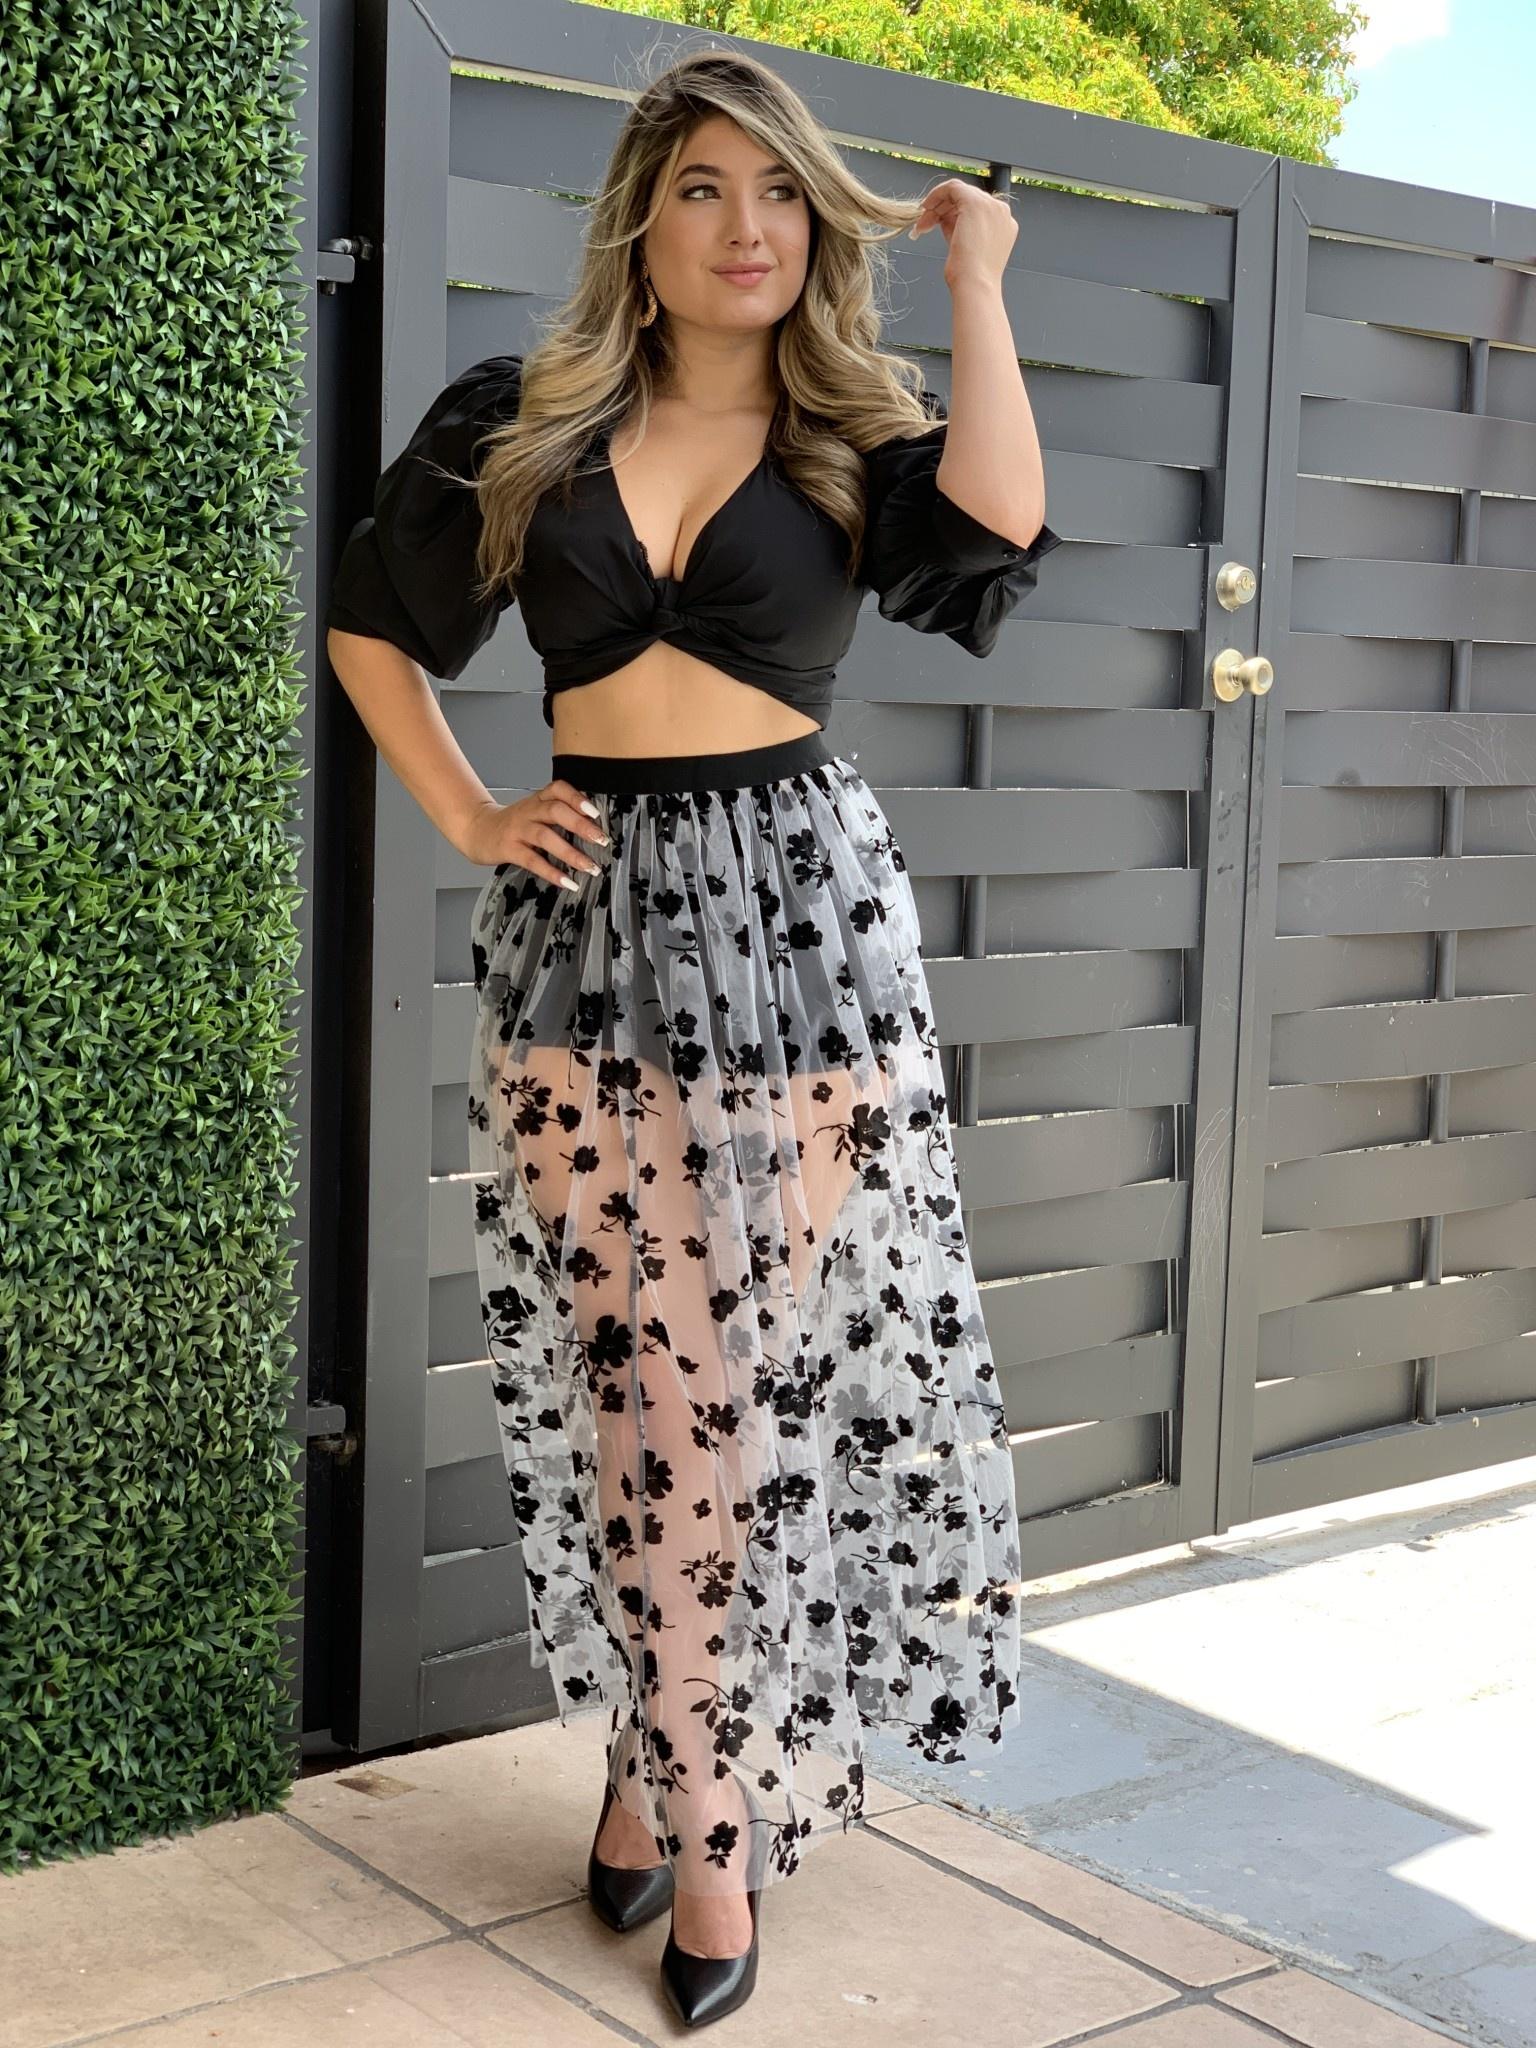 NF10971 High Waist Mesh Cover Up Skirt